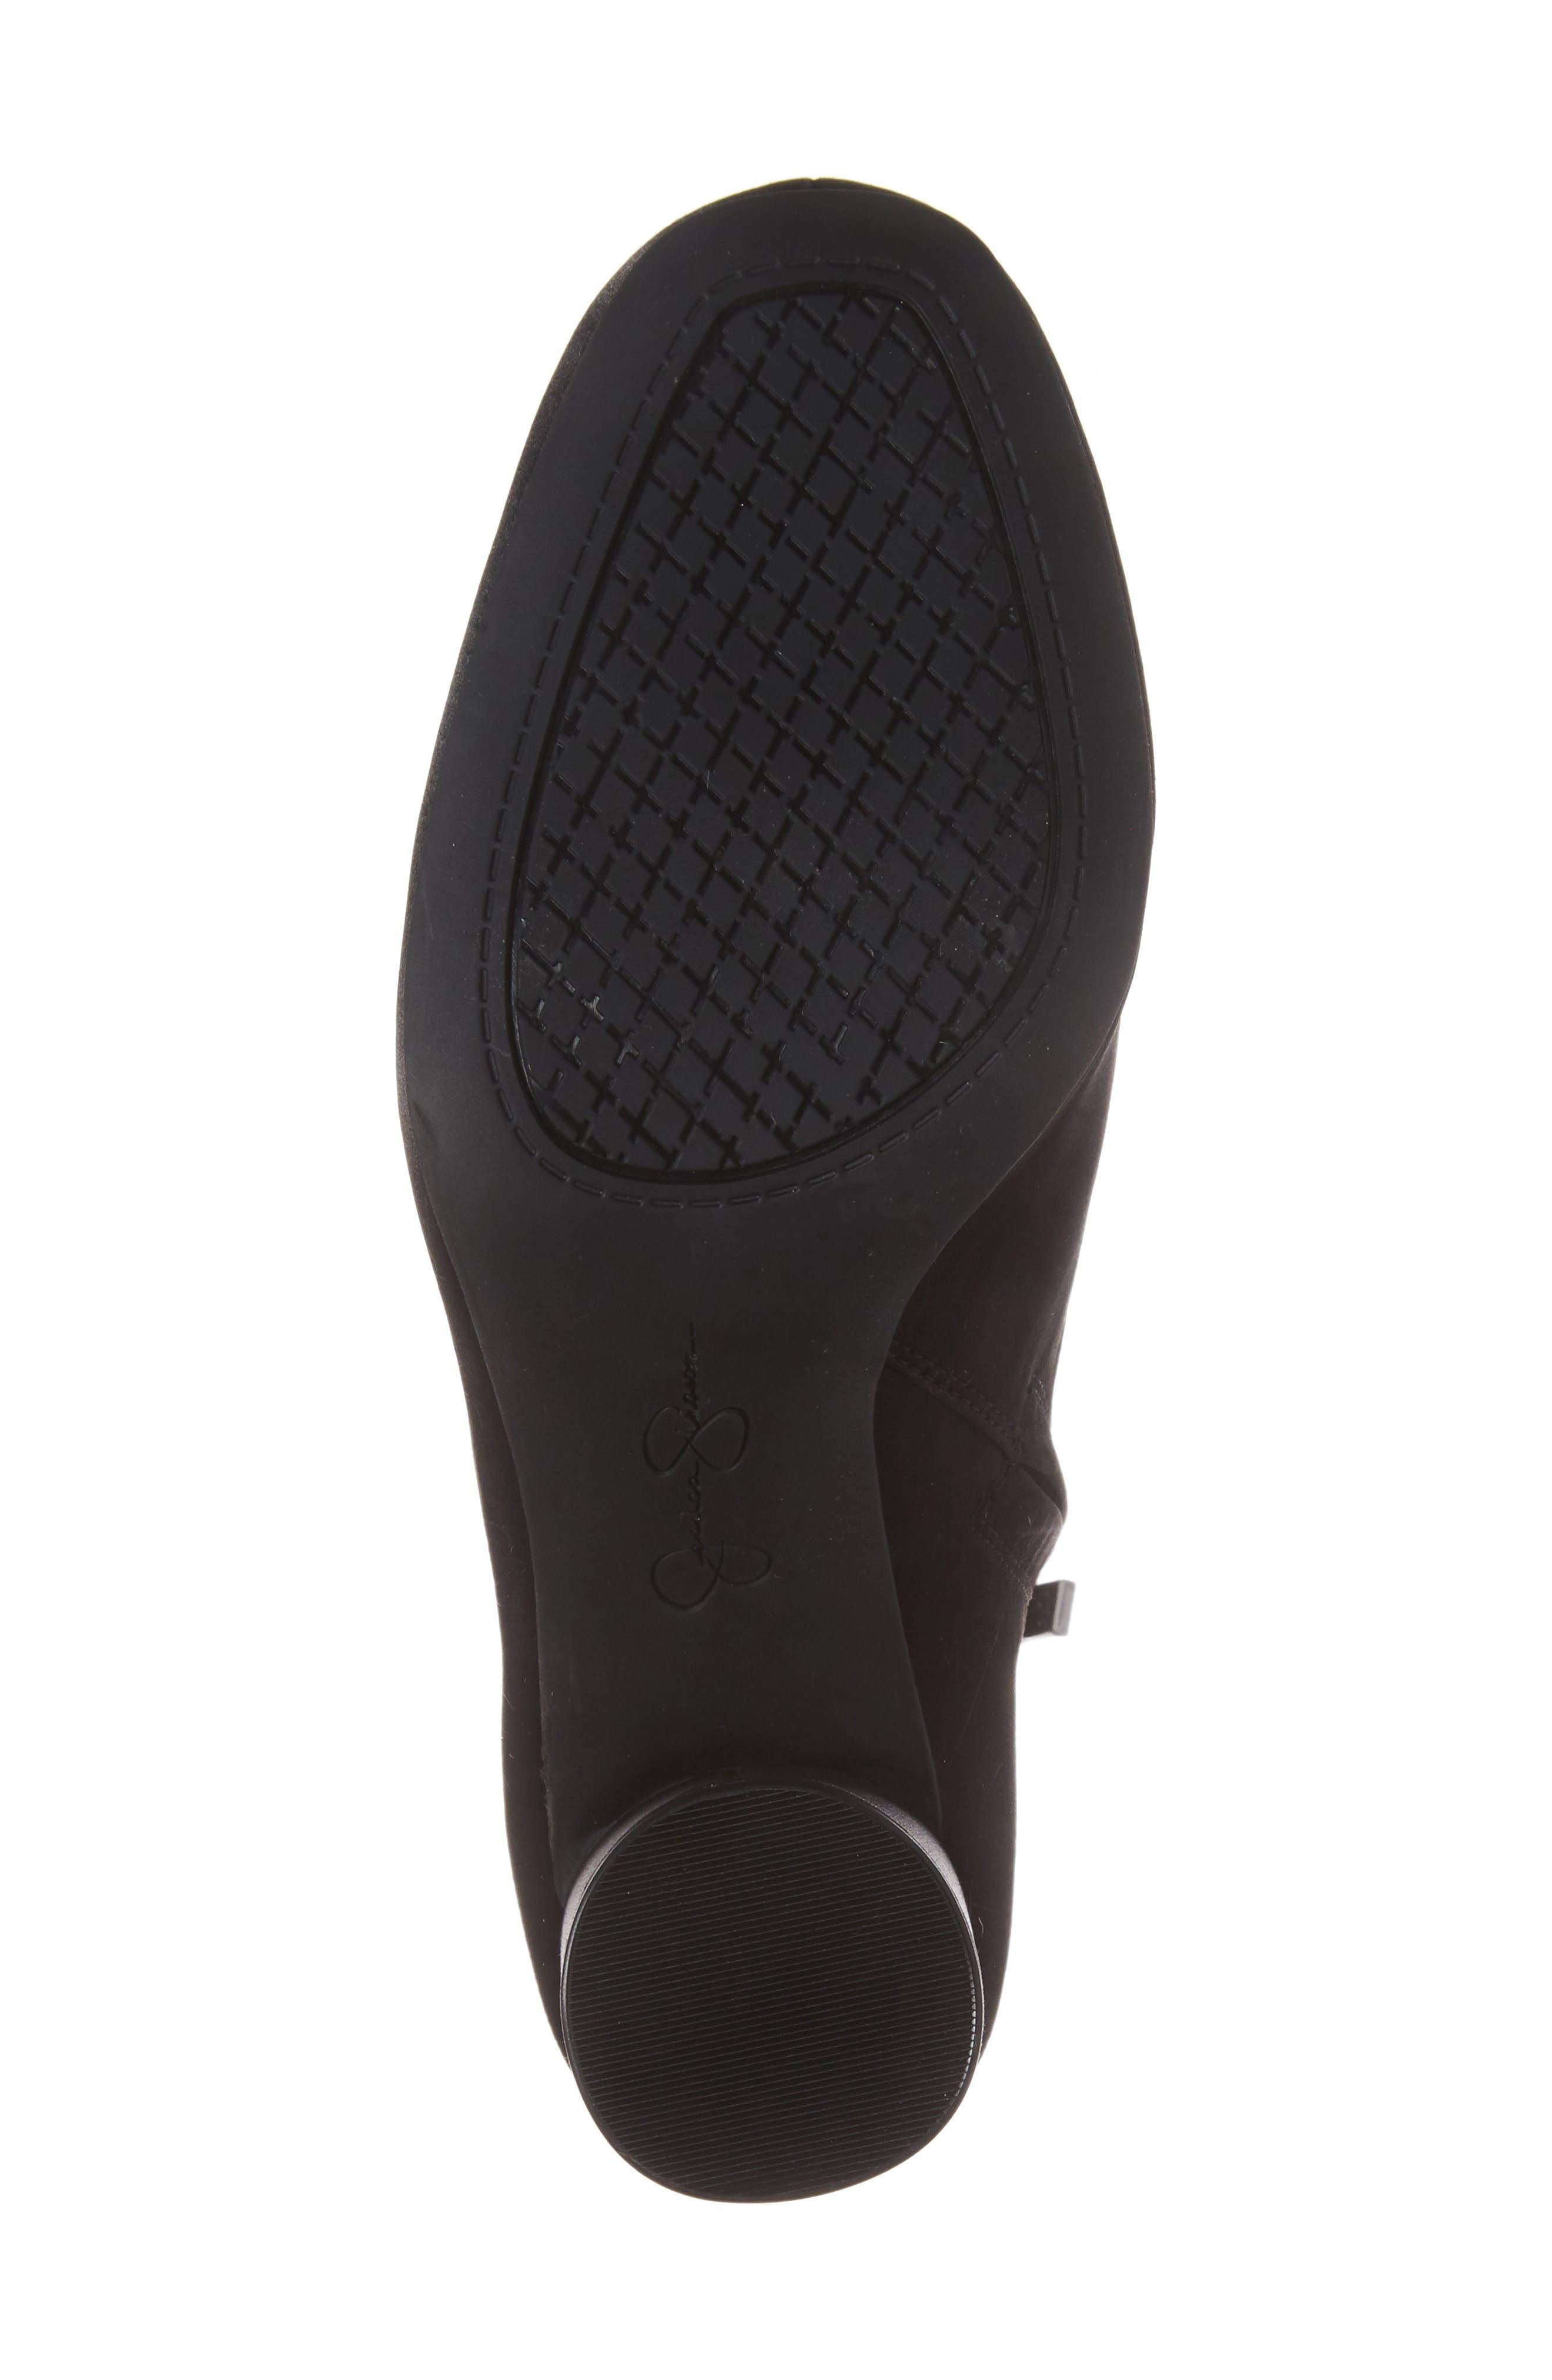 Merta Column Heel Bootie,                             Alternate thumbnail 6, color,                             Black Satin